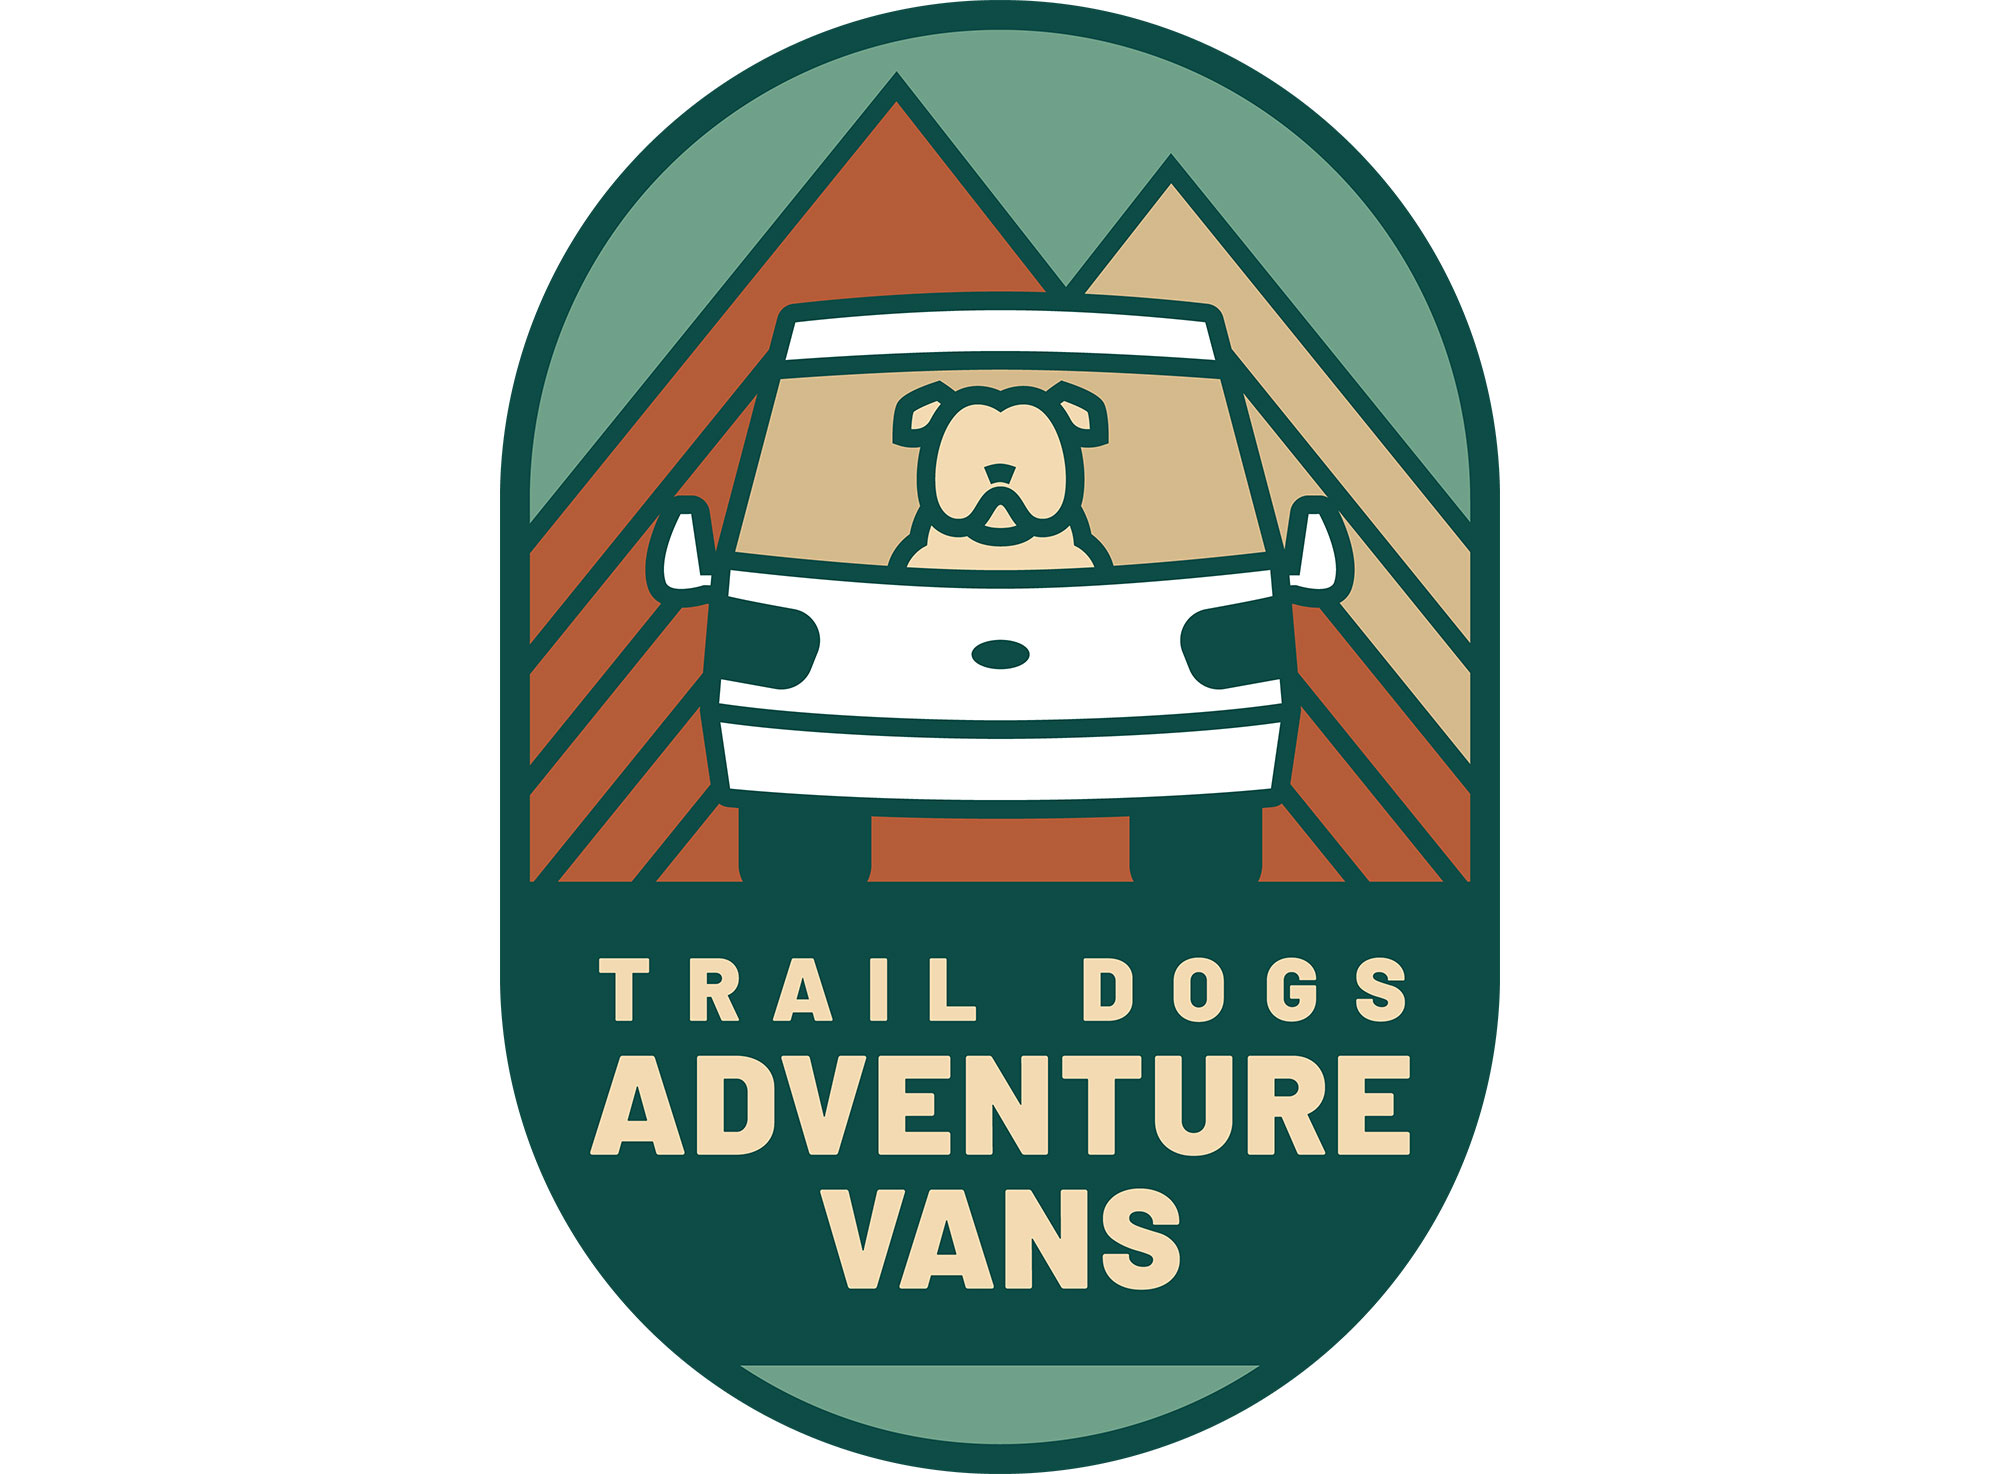 Primary logo, full color